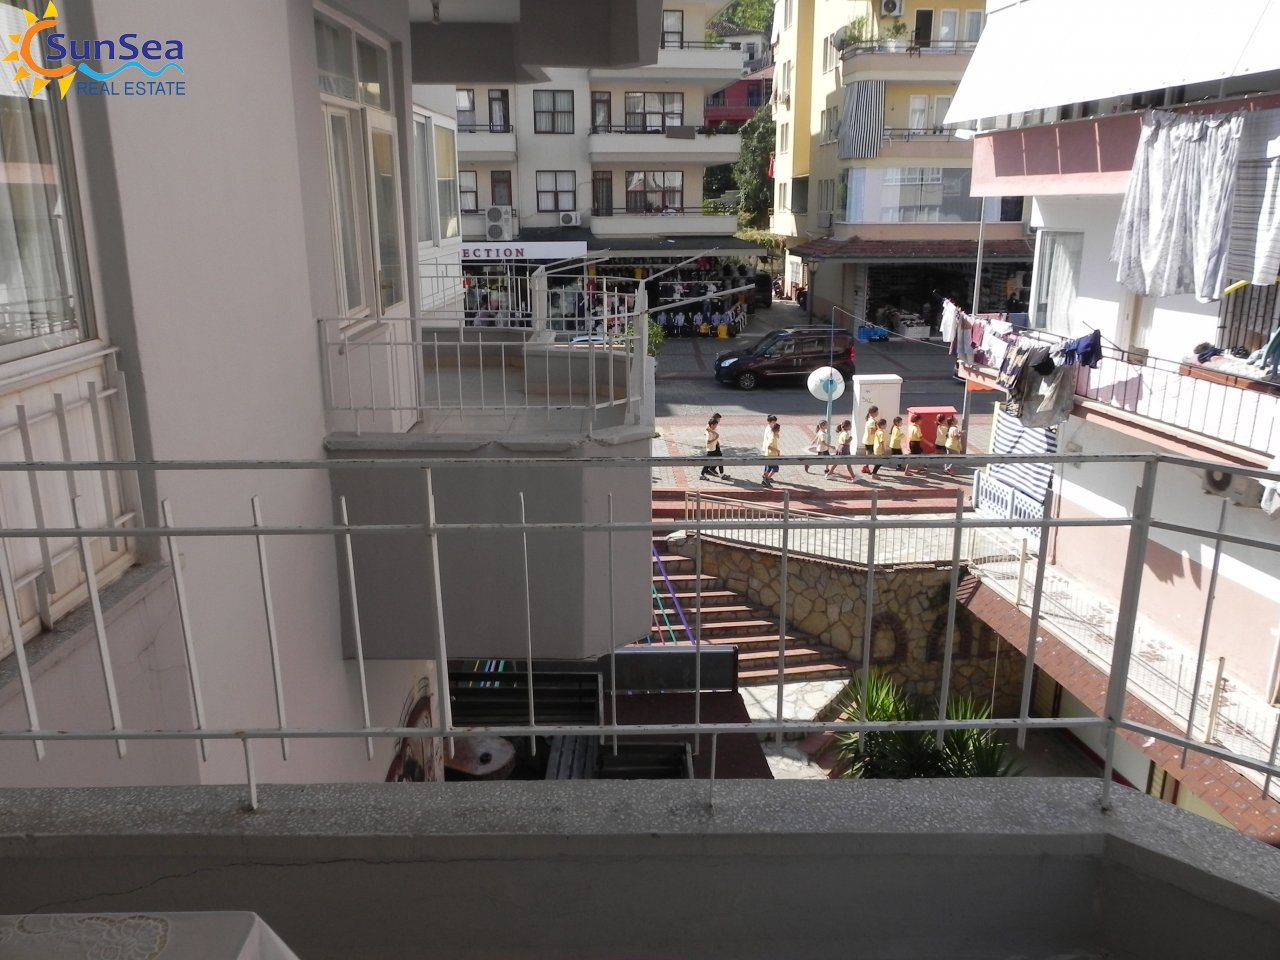 Onur apartment damlataş view front